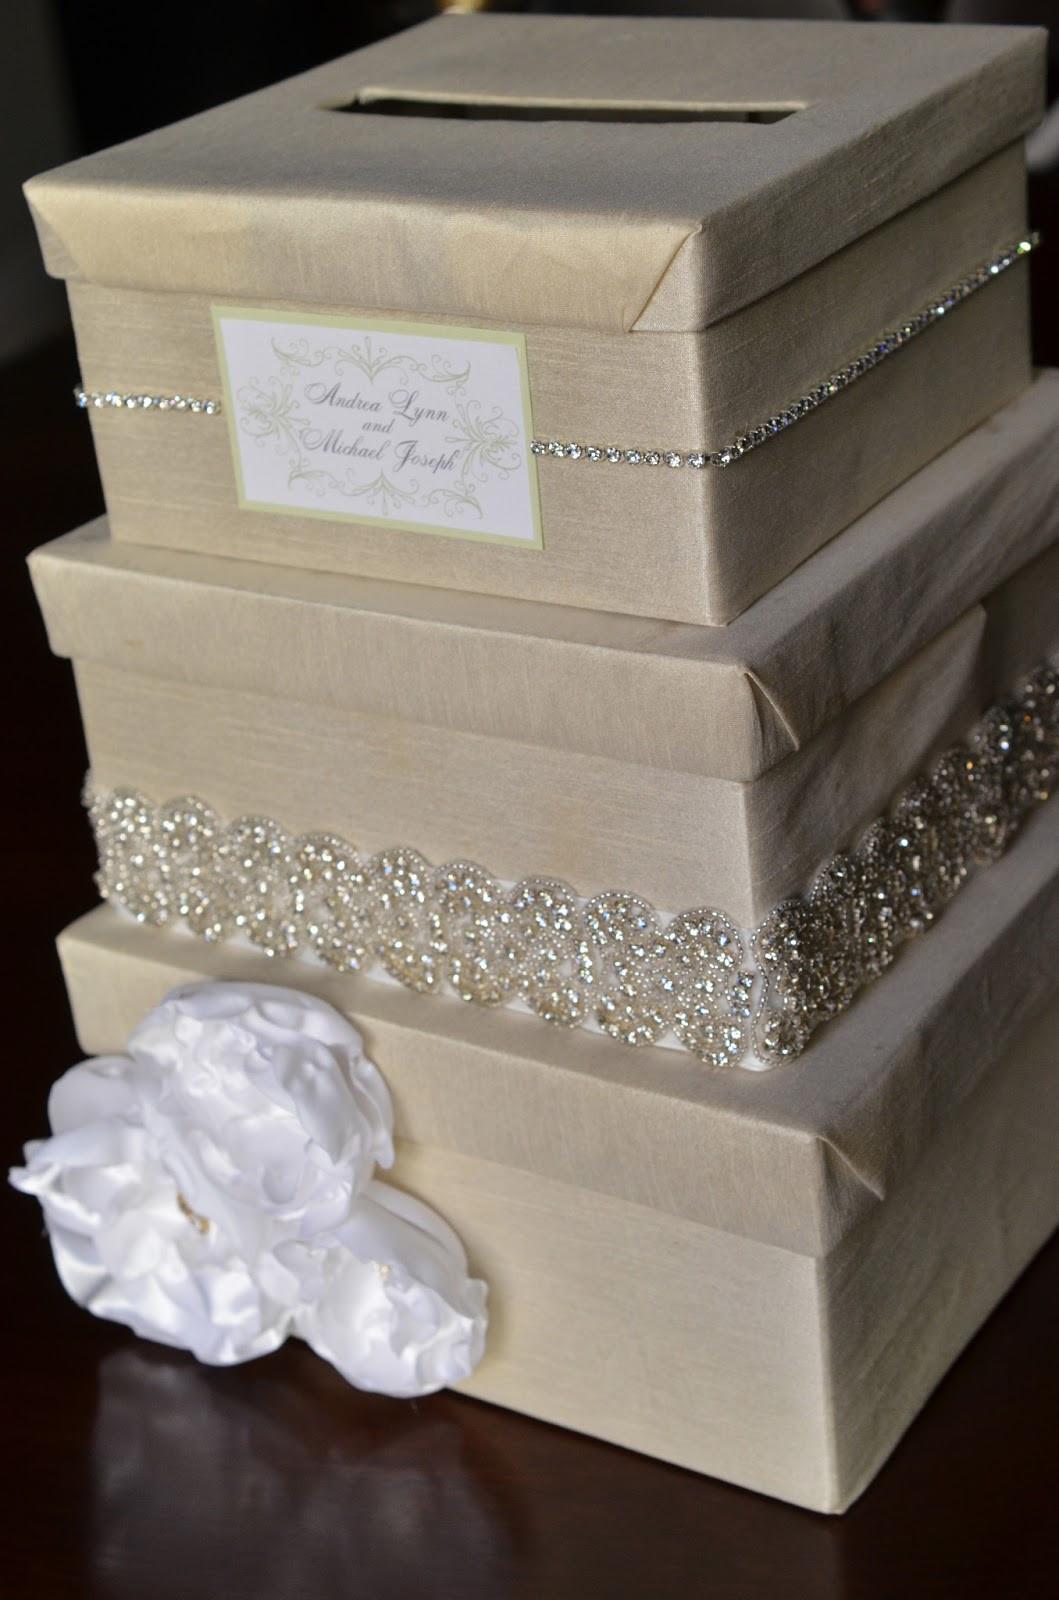 Best ideas about Wedding Card Boxes DIY . Save or Pin DIY Wedding Card Box Tutorial Andrea Lynn HANDMADE Now.